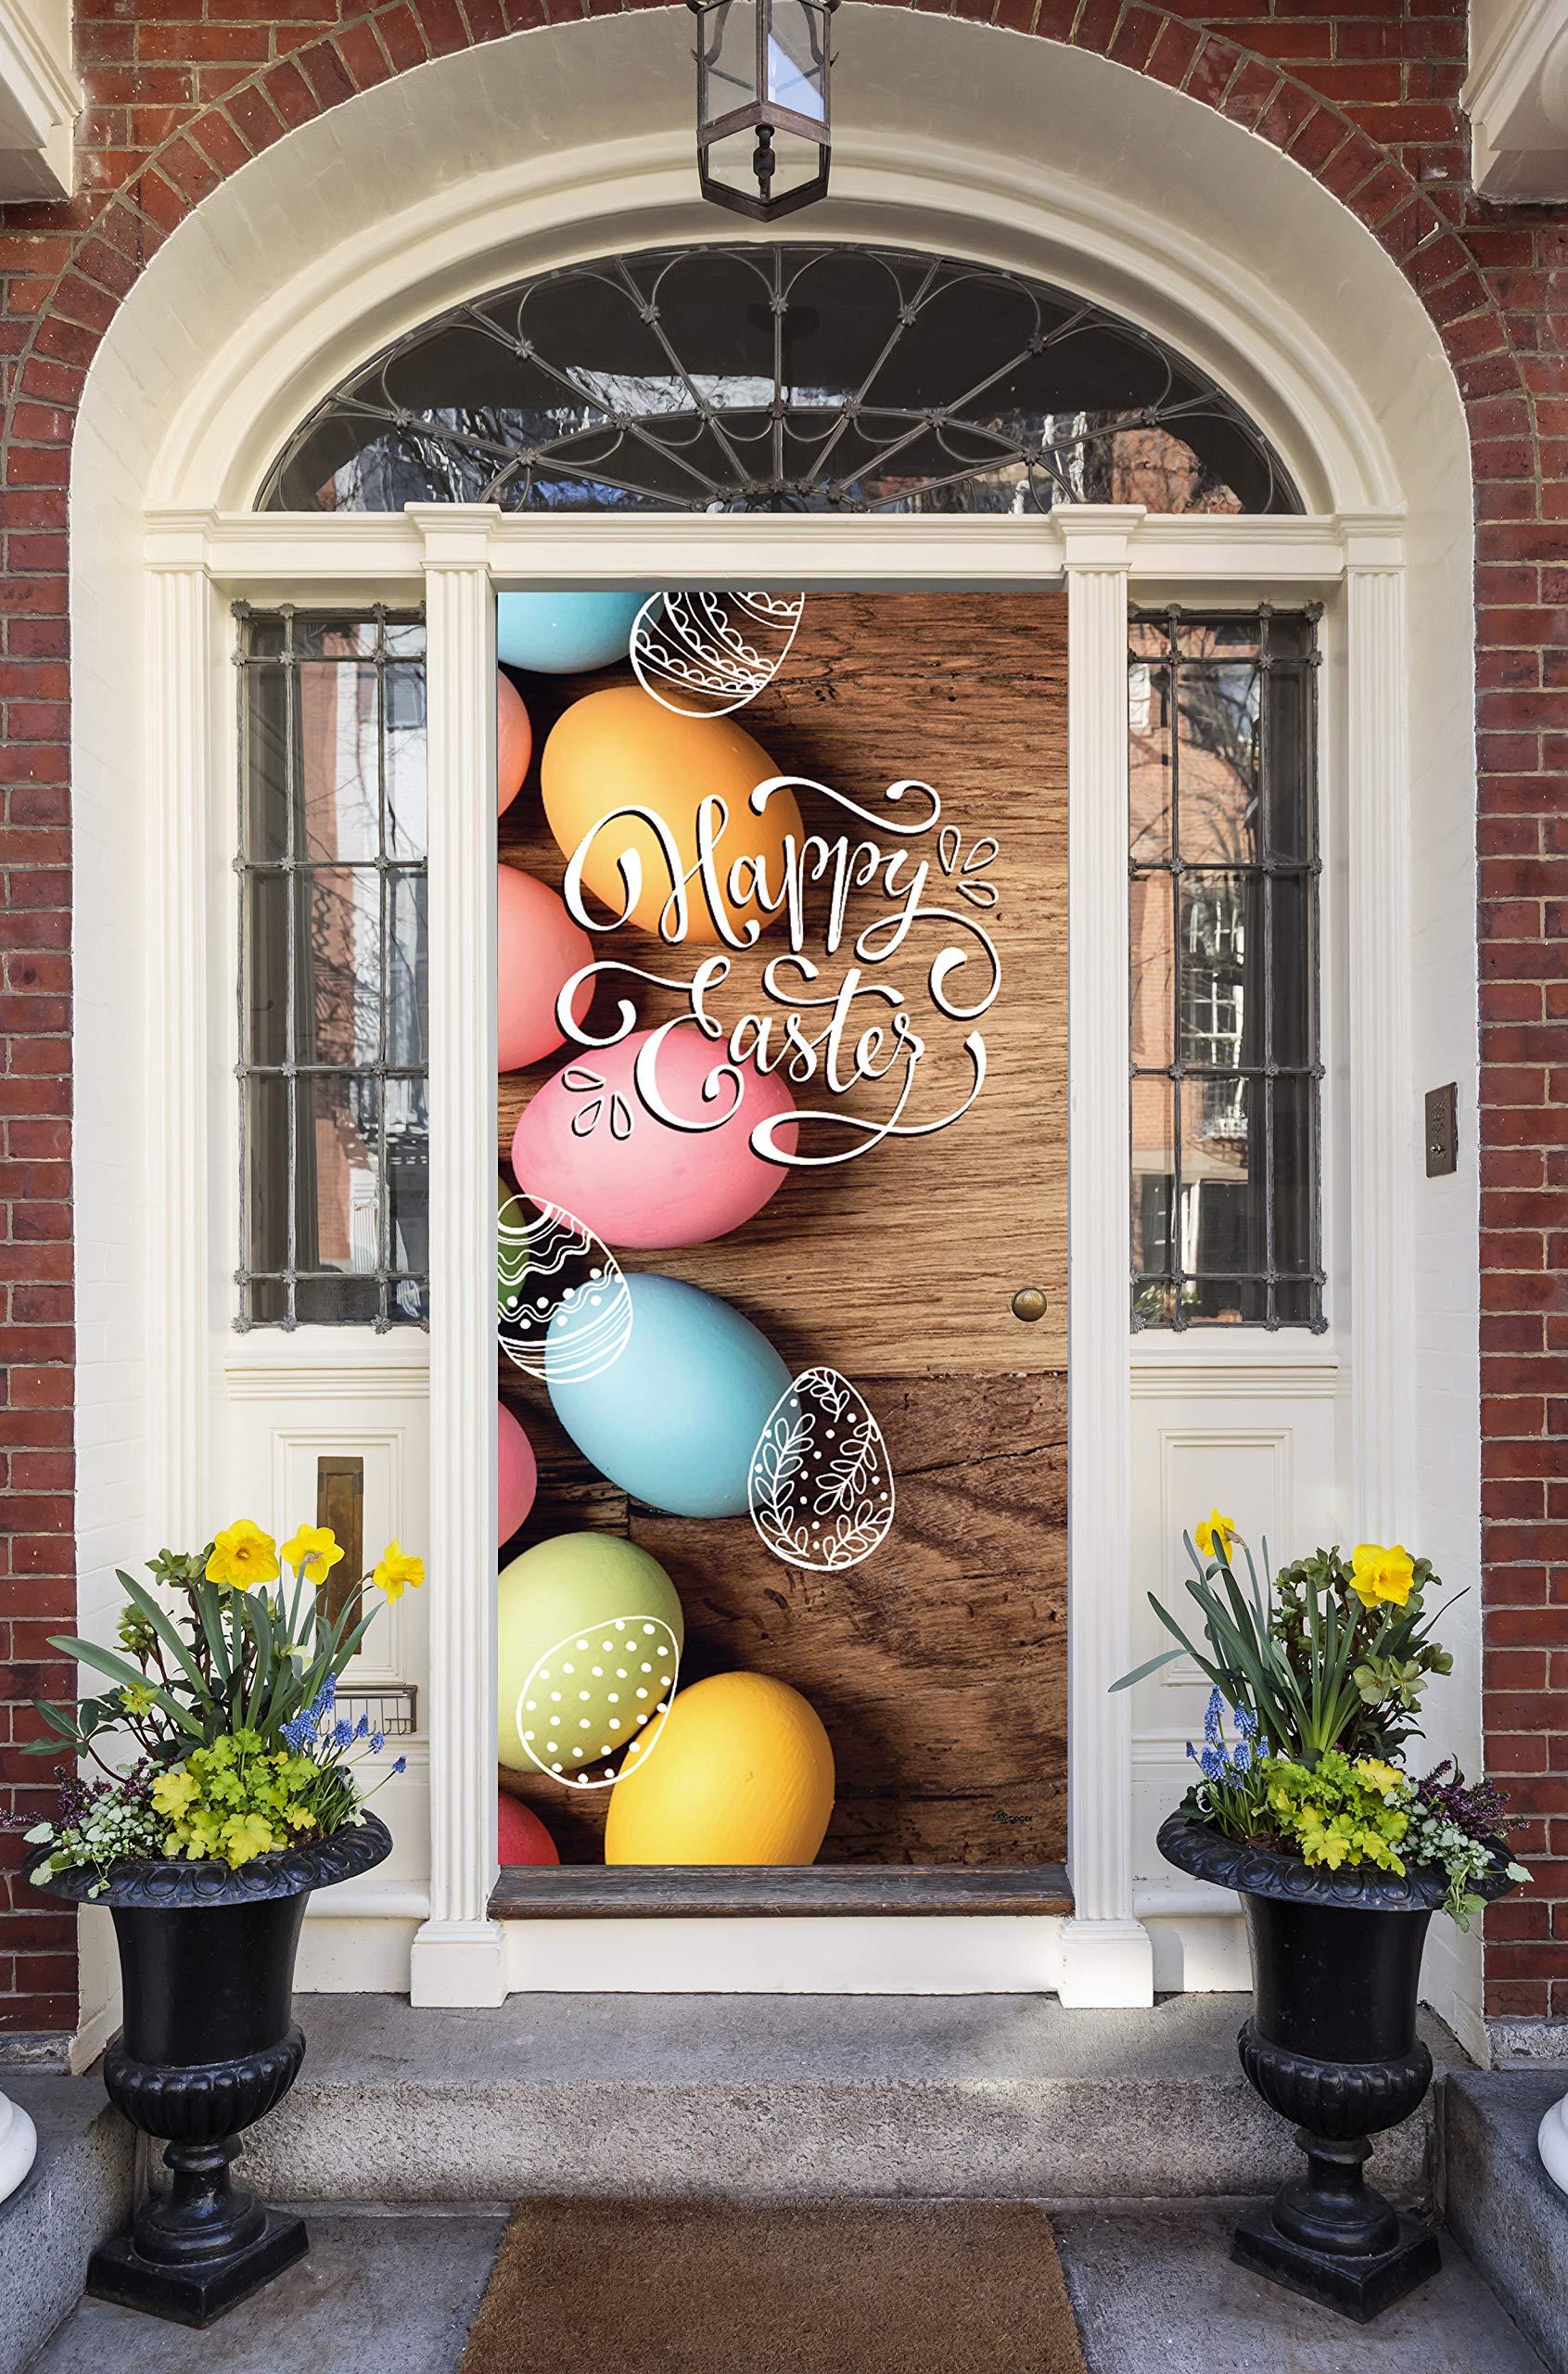 Victory Corps Happy Easter Eggs - Holiday Front Door Banner Mural Sign Décor 36'' x 80'' Front Door - The Original Holiday Front Door Banner Decor